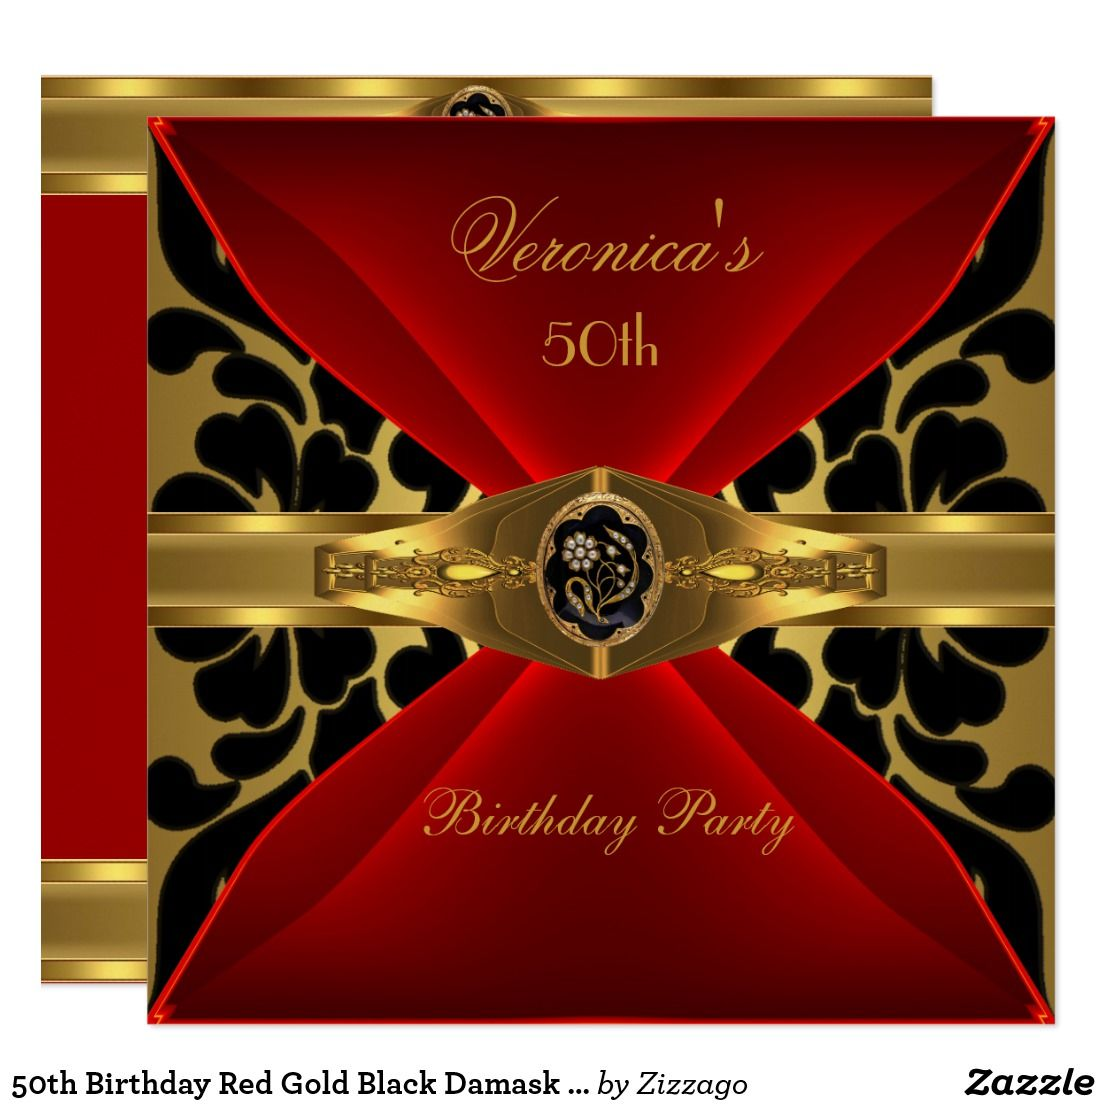 50th Birthday Red Gold Black Damask Floral Jewel Invitation   Zazzle.com in  2020   Jewel invitations, 50th birthday, 50th birthday invitations